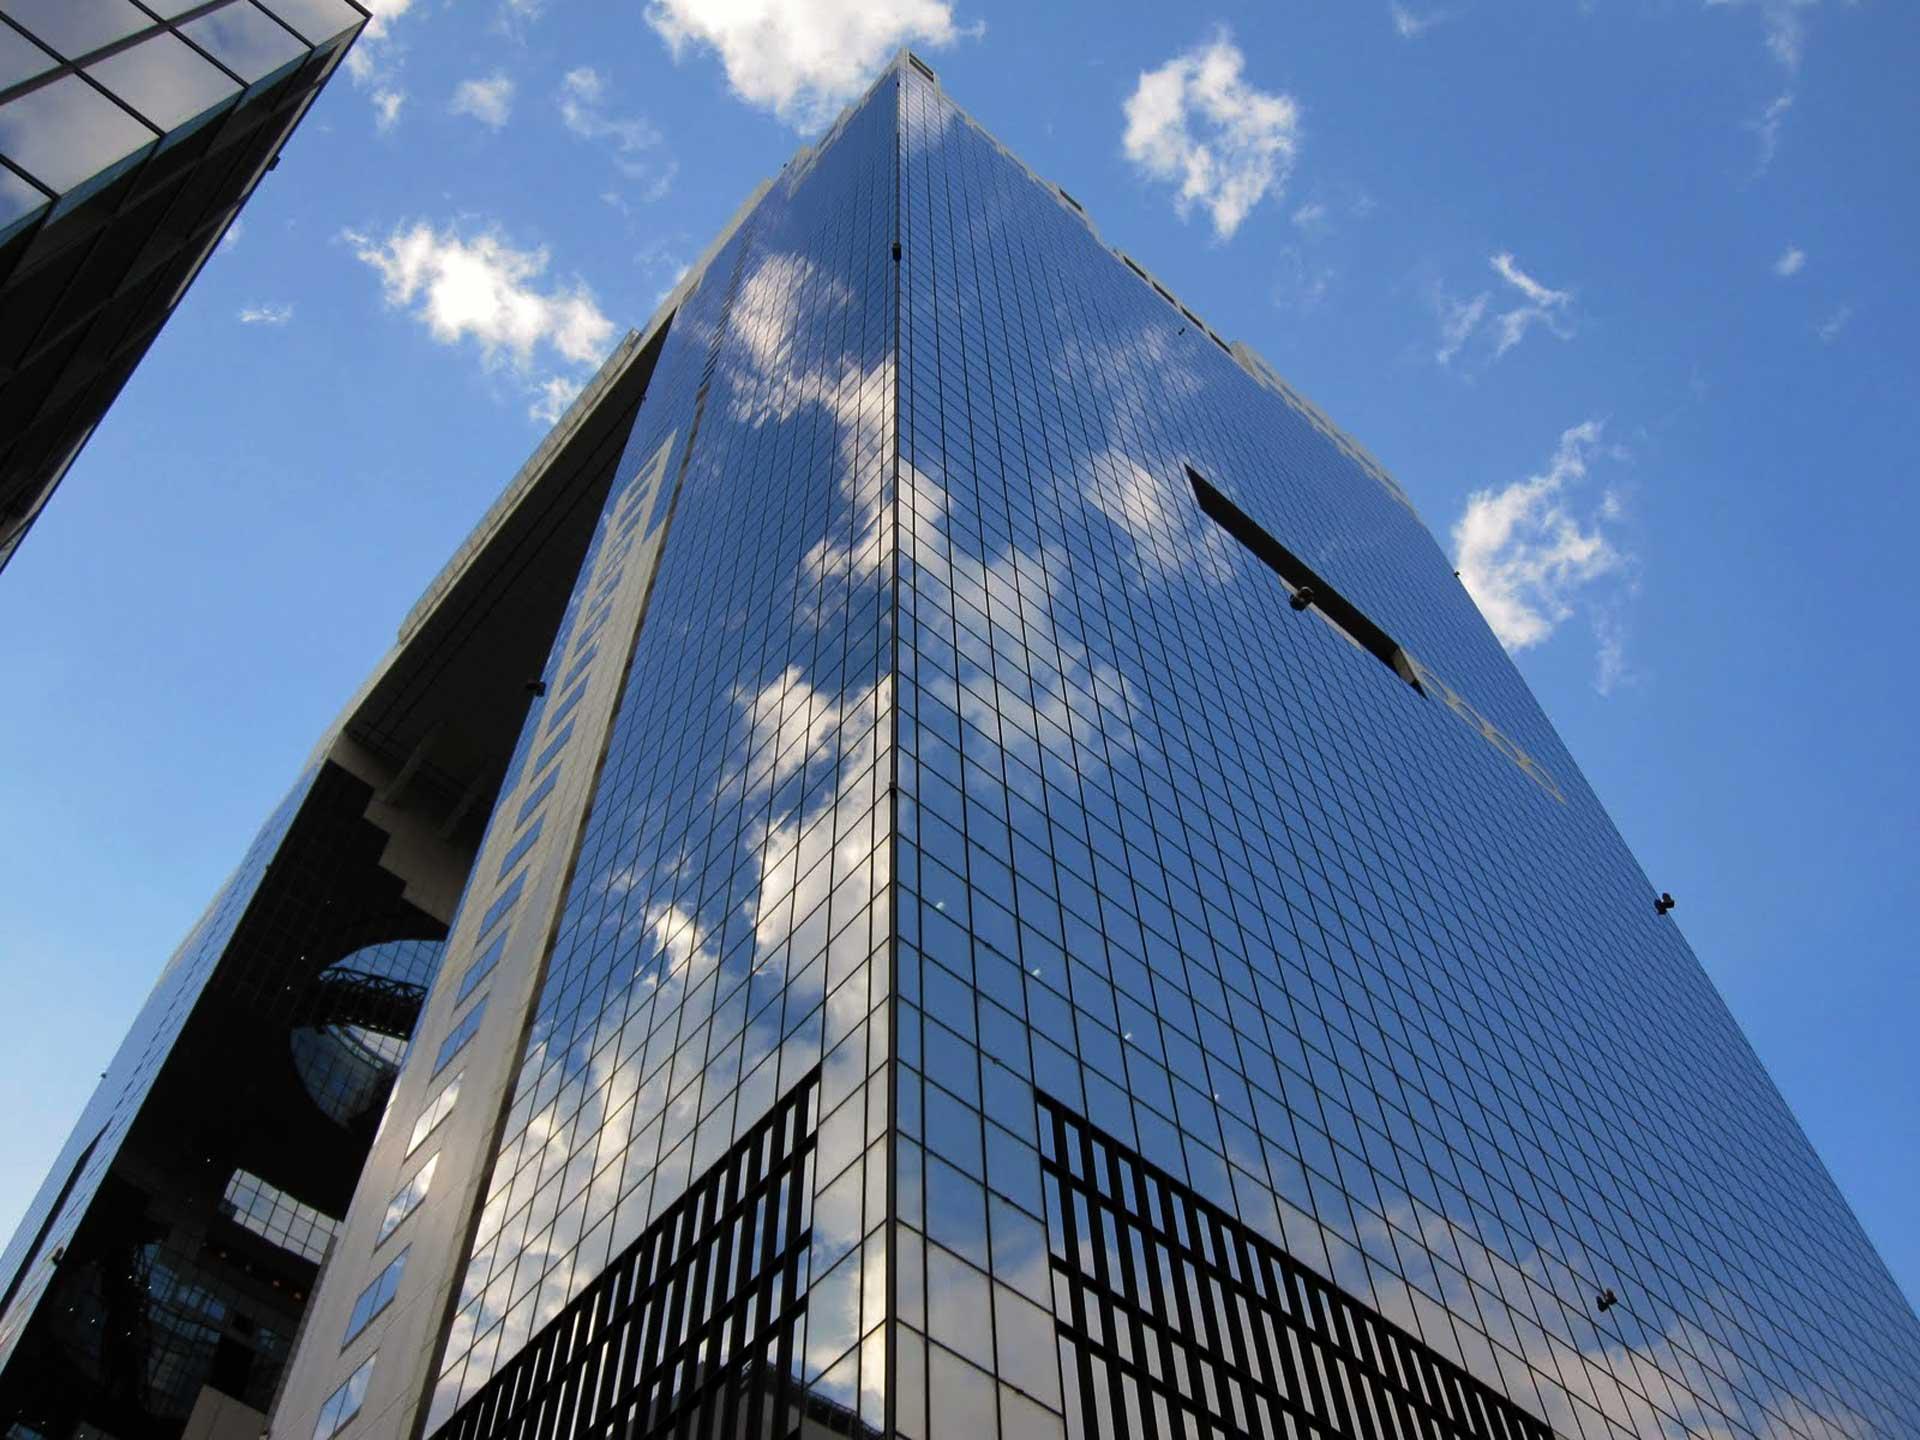 Edificio de oficinas vel zquez 34 madrid grupo rosales inmobiliario grupo rosales - Edificio de oficinas ...